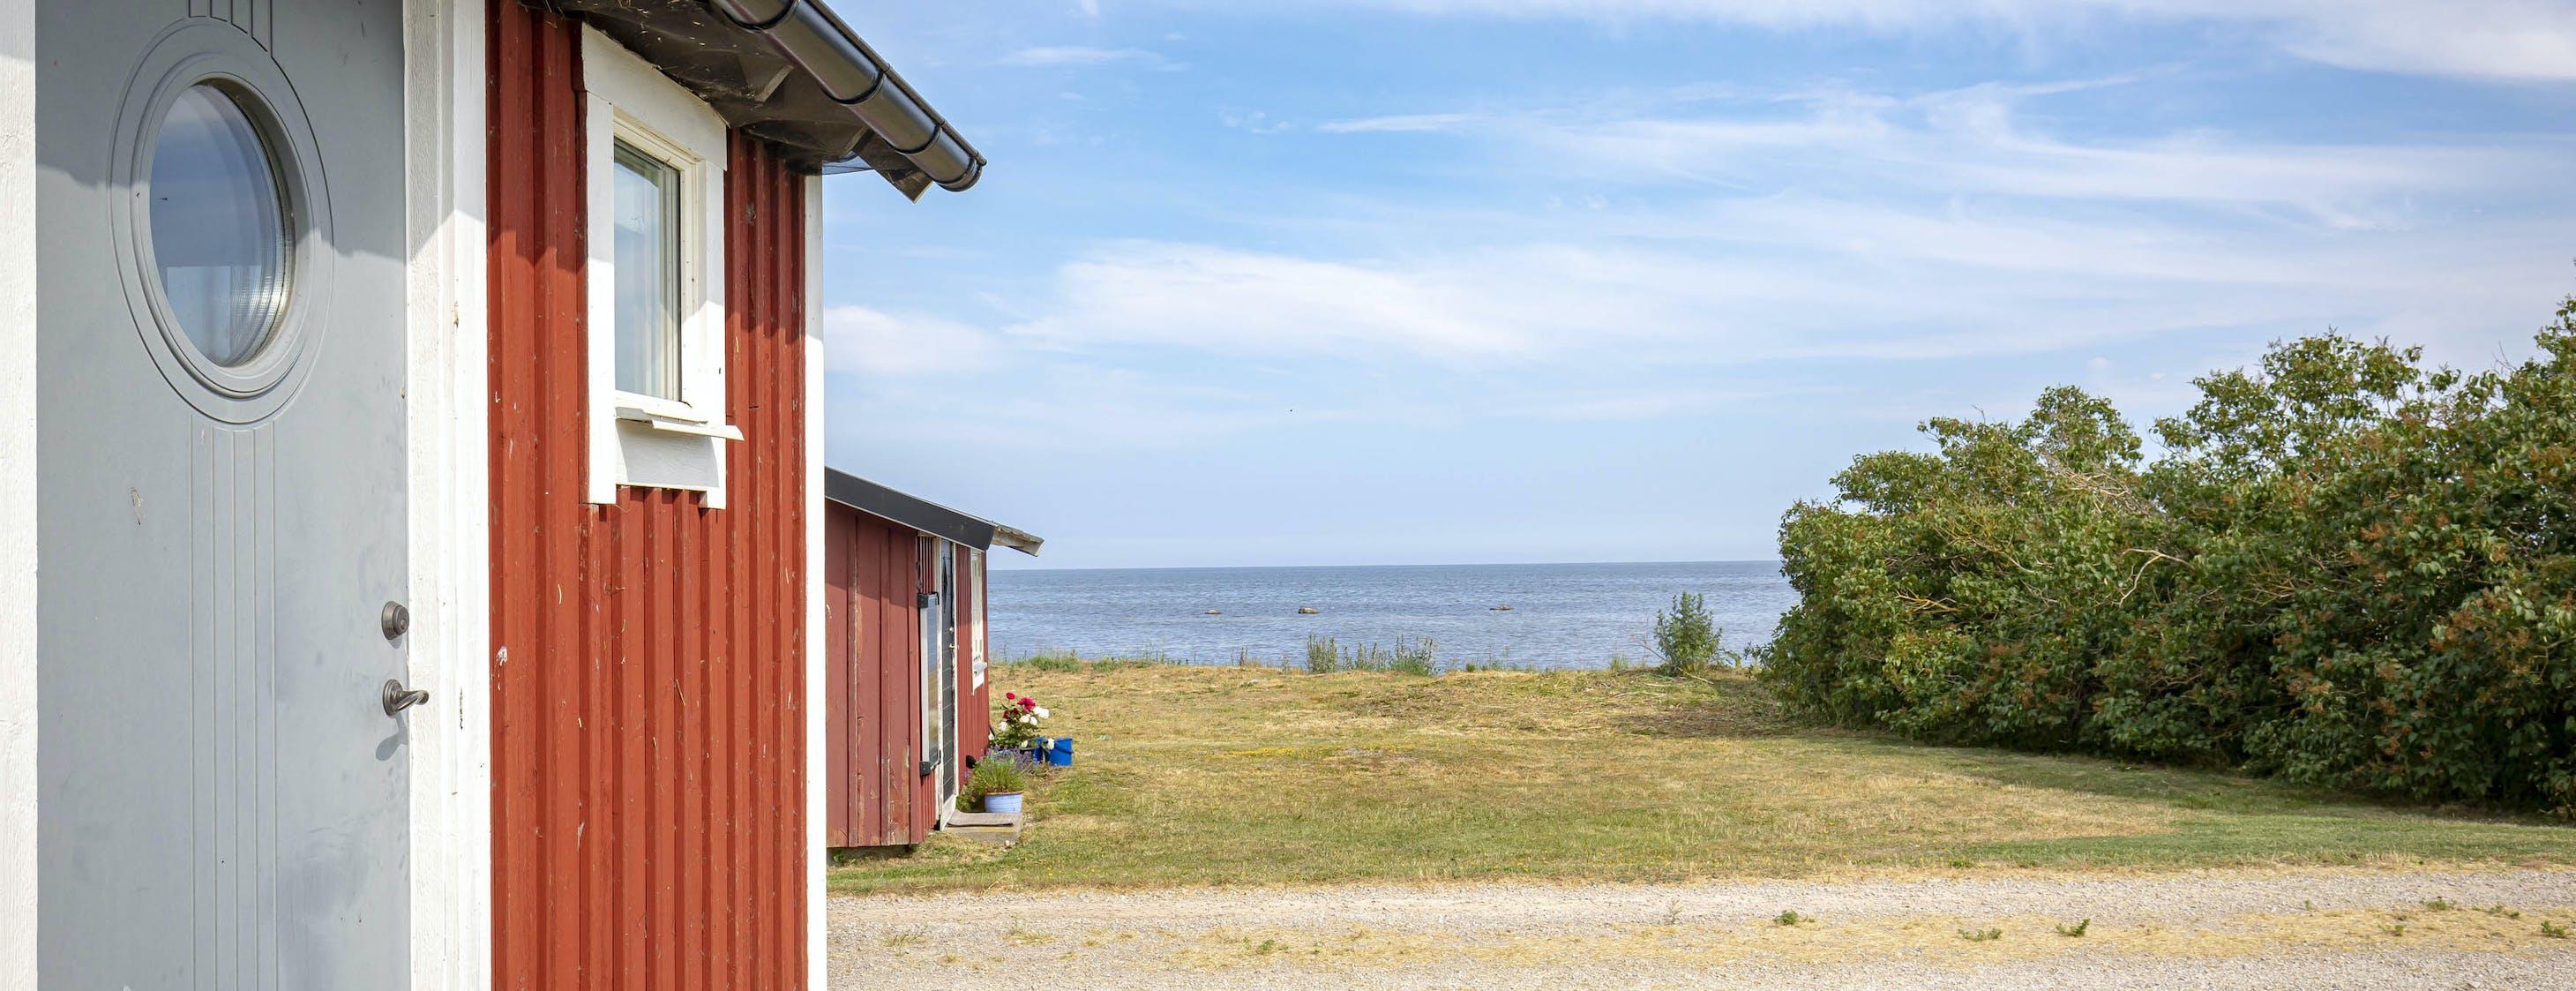 Skärlöv 411 - Sjöbod 23 Skärlövs hamn